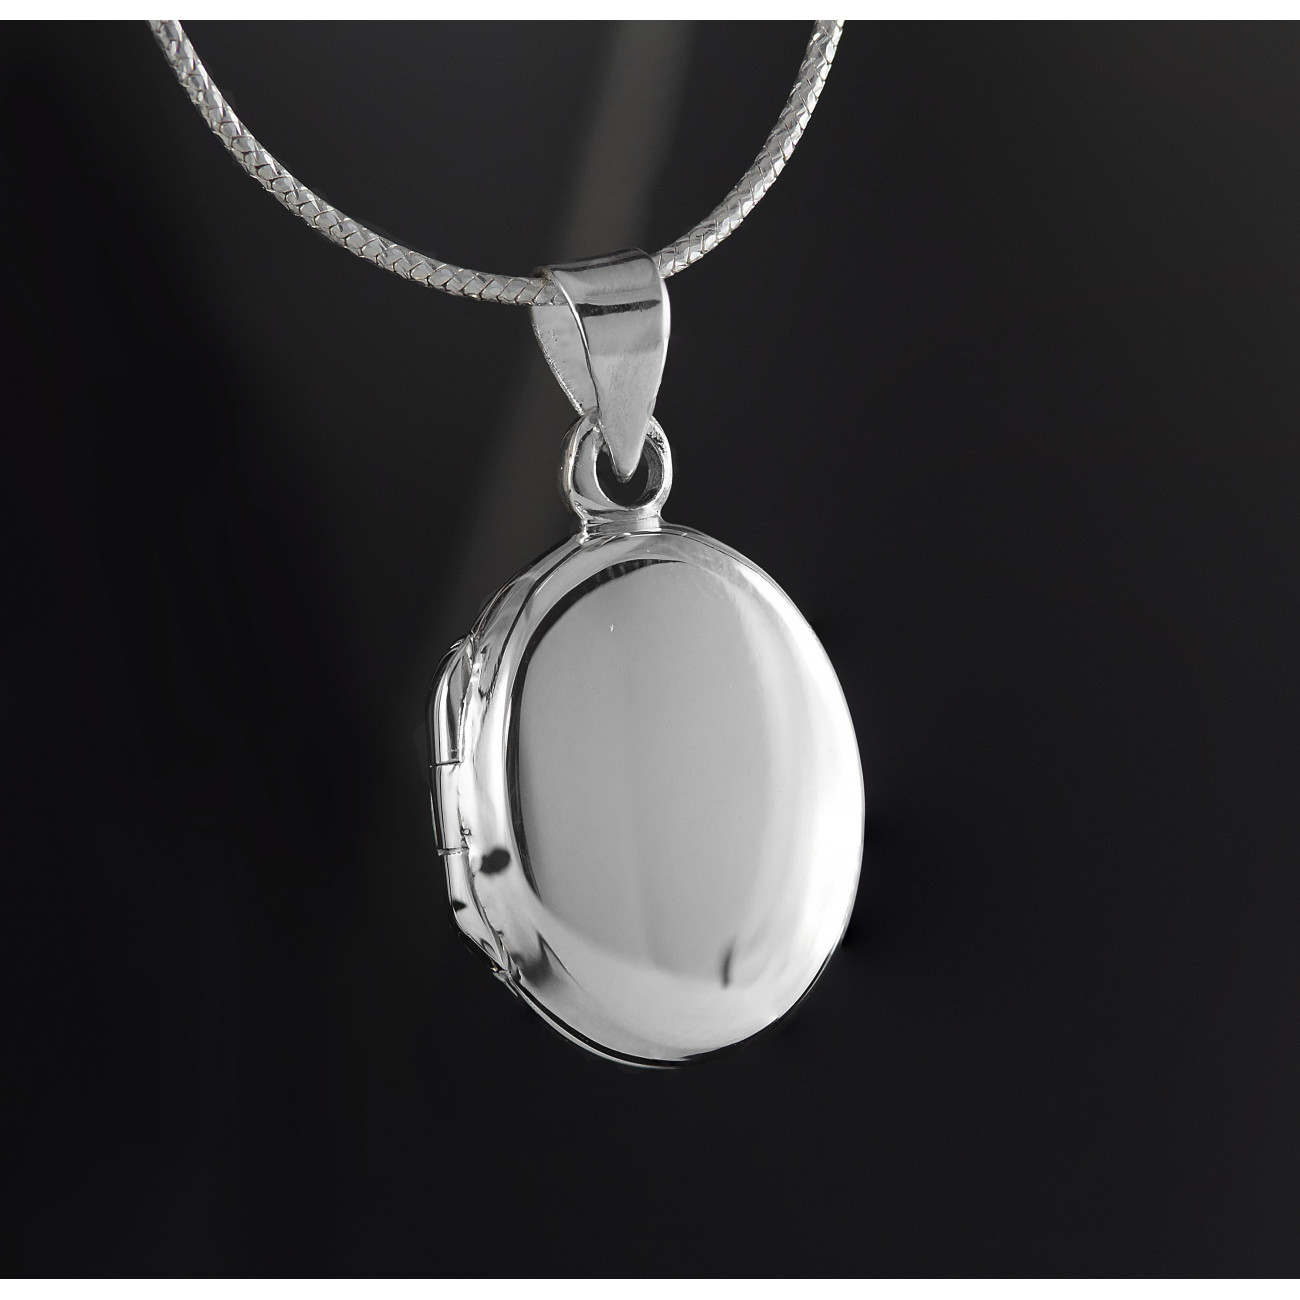 Oválný, stříbrný medailonek na krk Savour